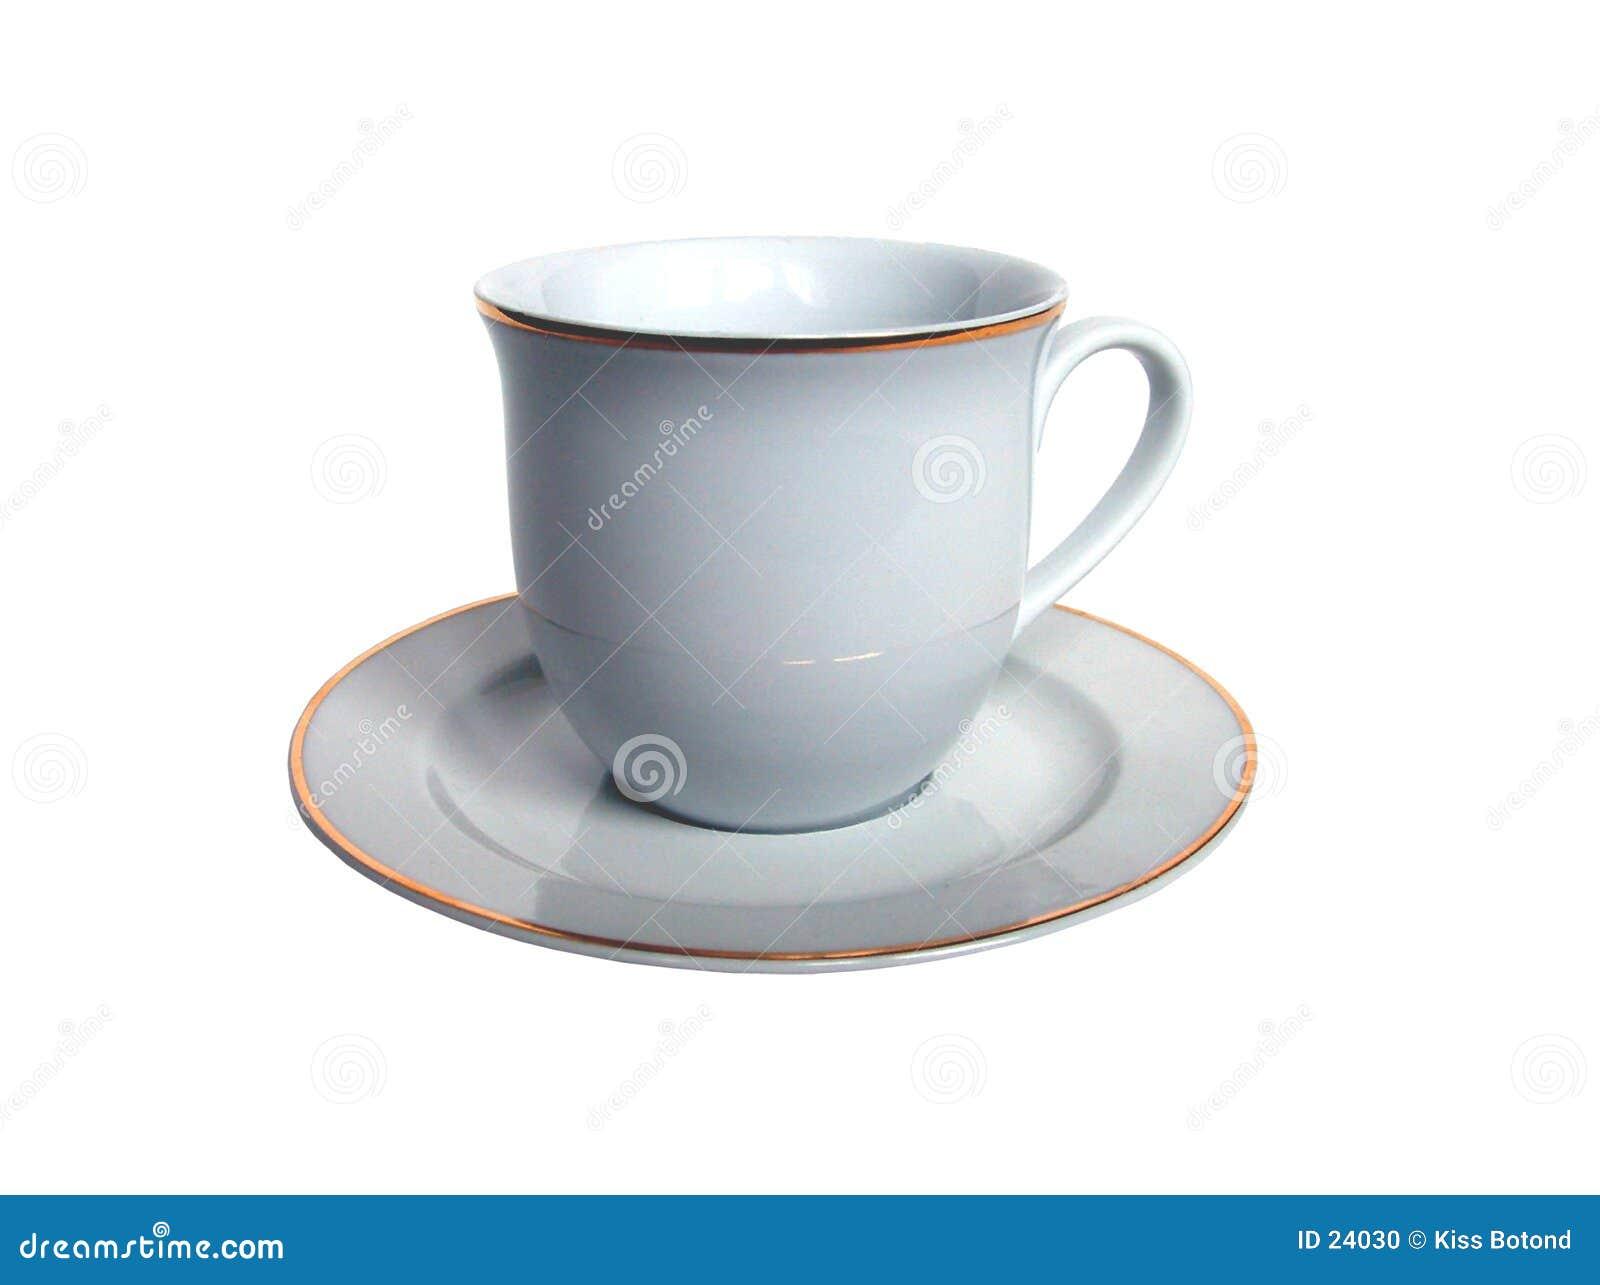 Caffecup tradizionale